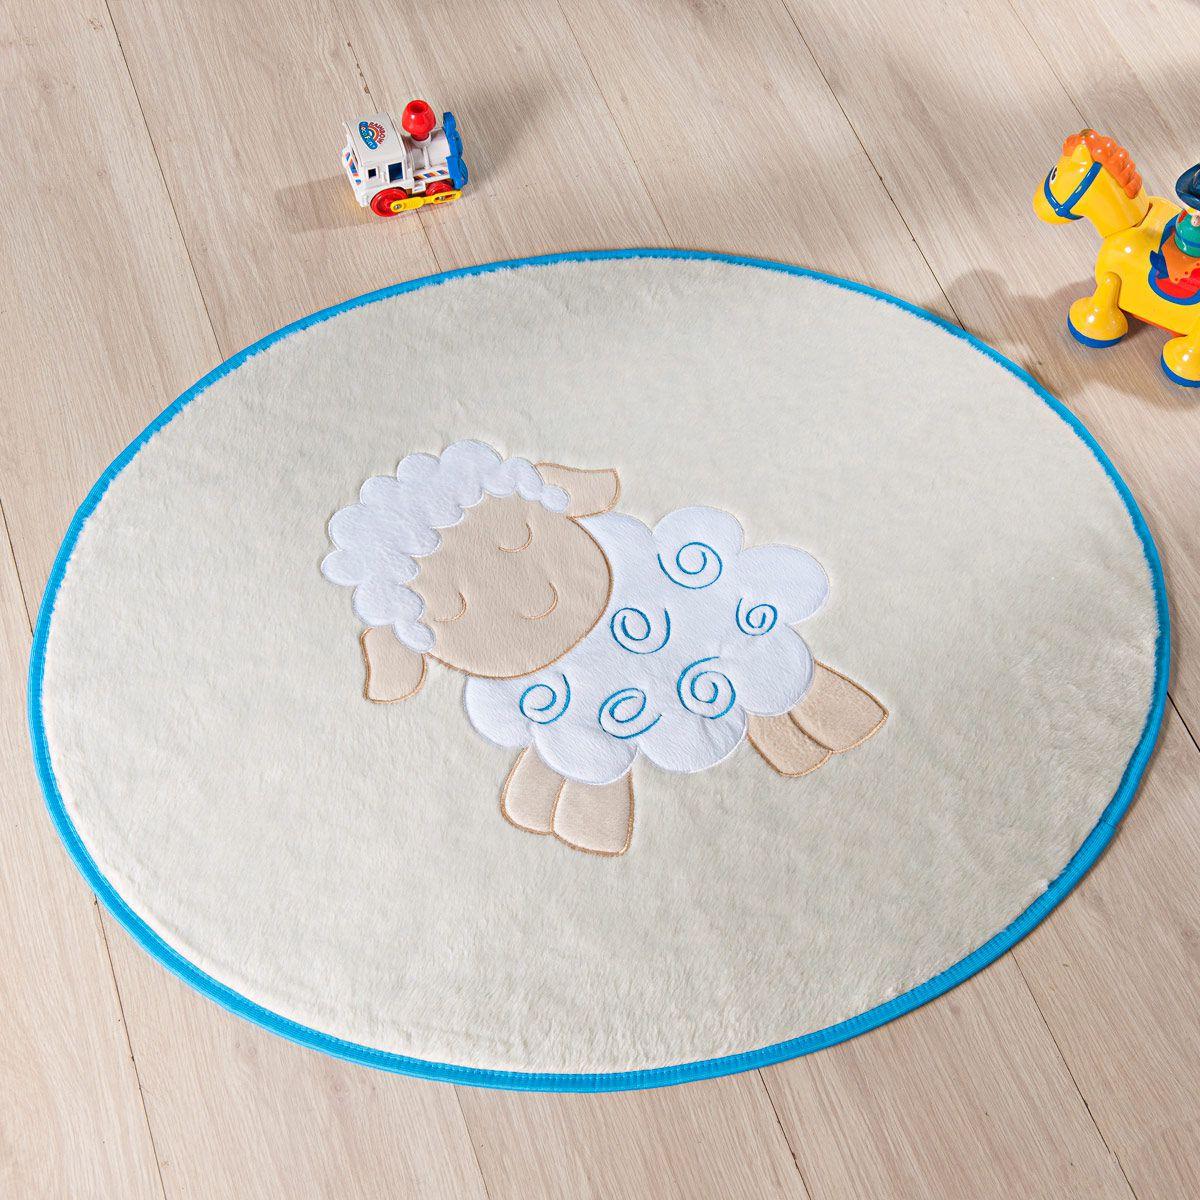 Tapete Infantil Premium Baby Formato Ovelhinha Azul Turquesa 78cm x 68cm